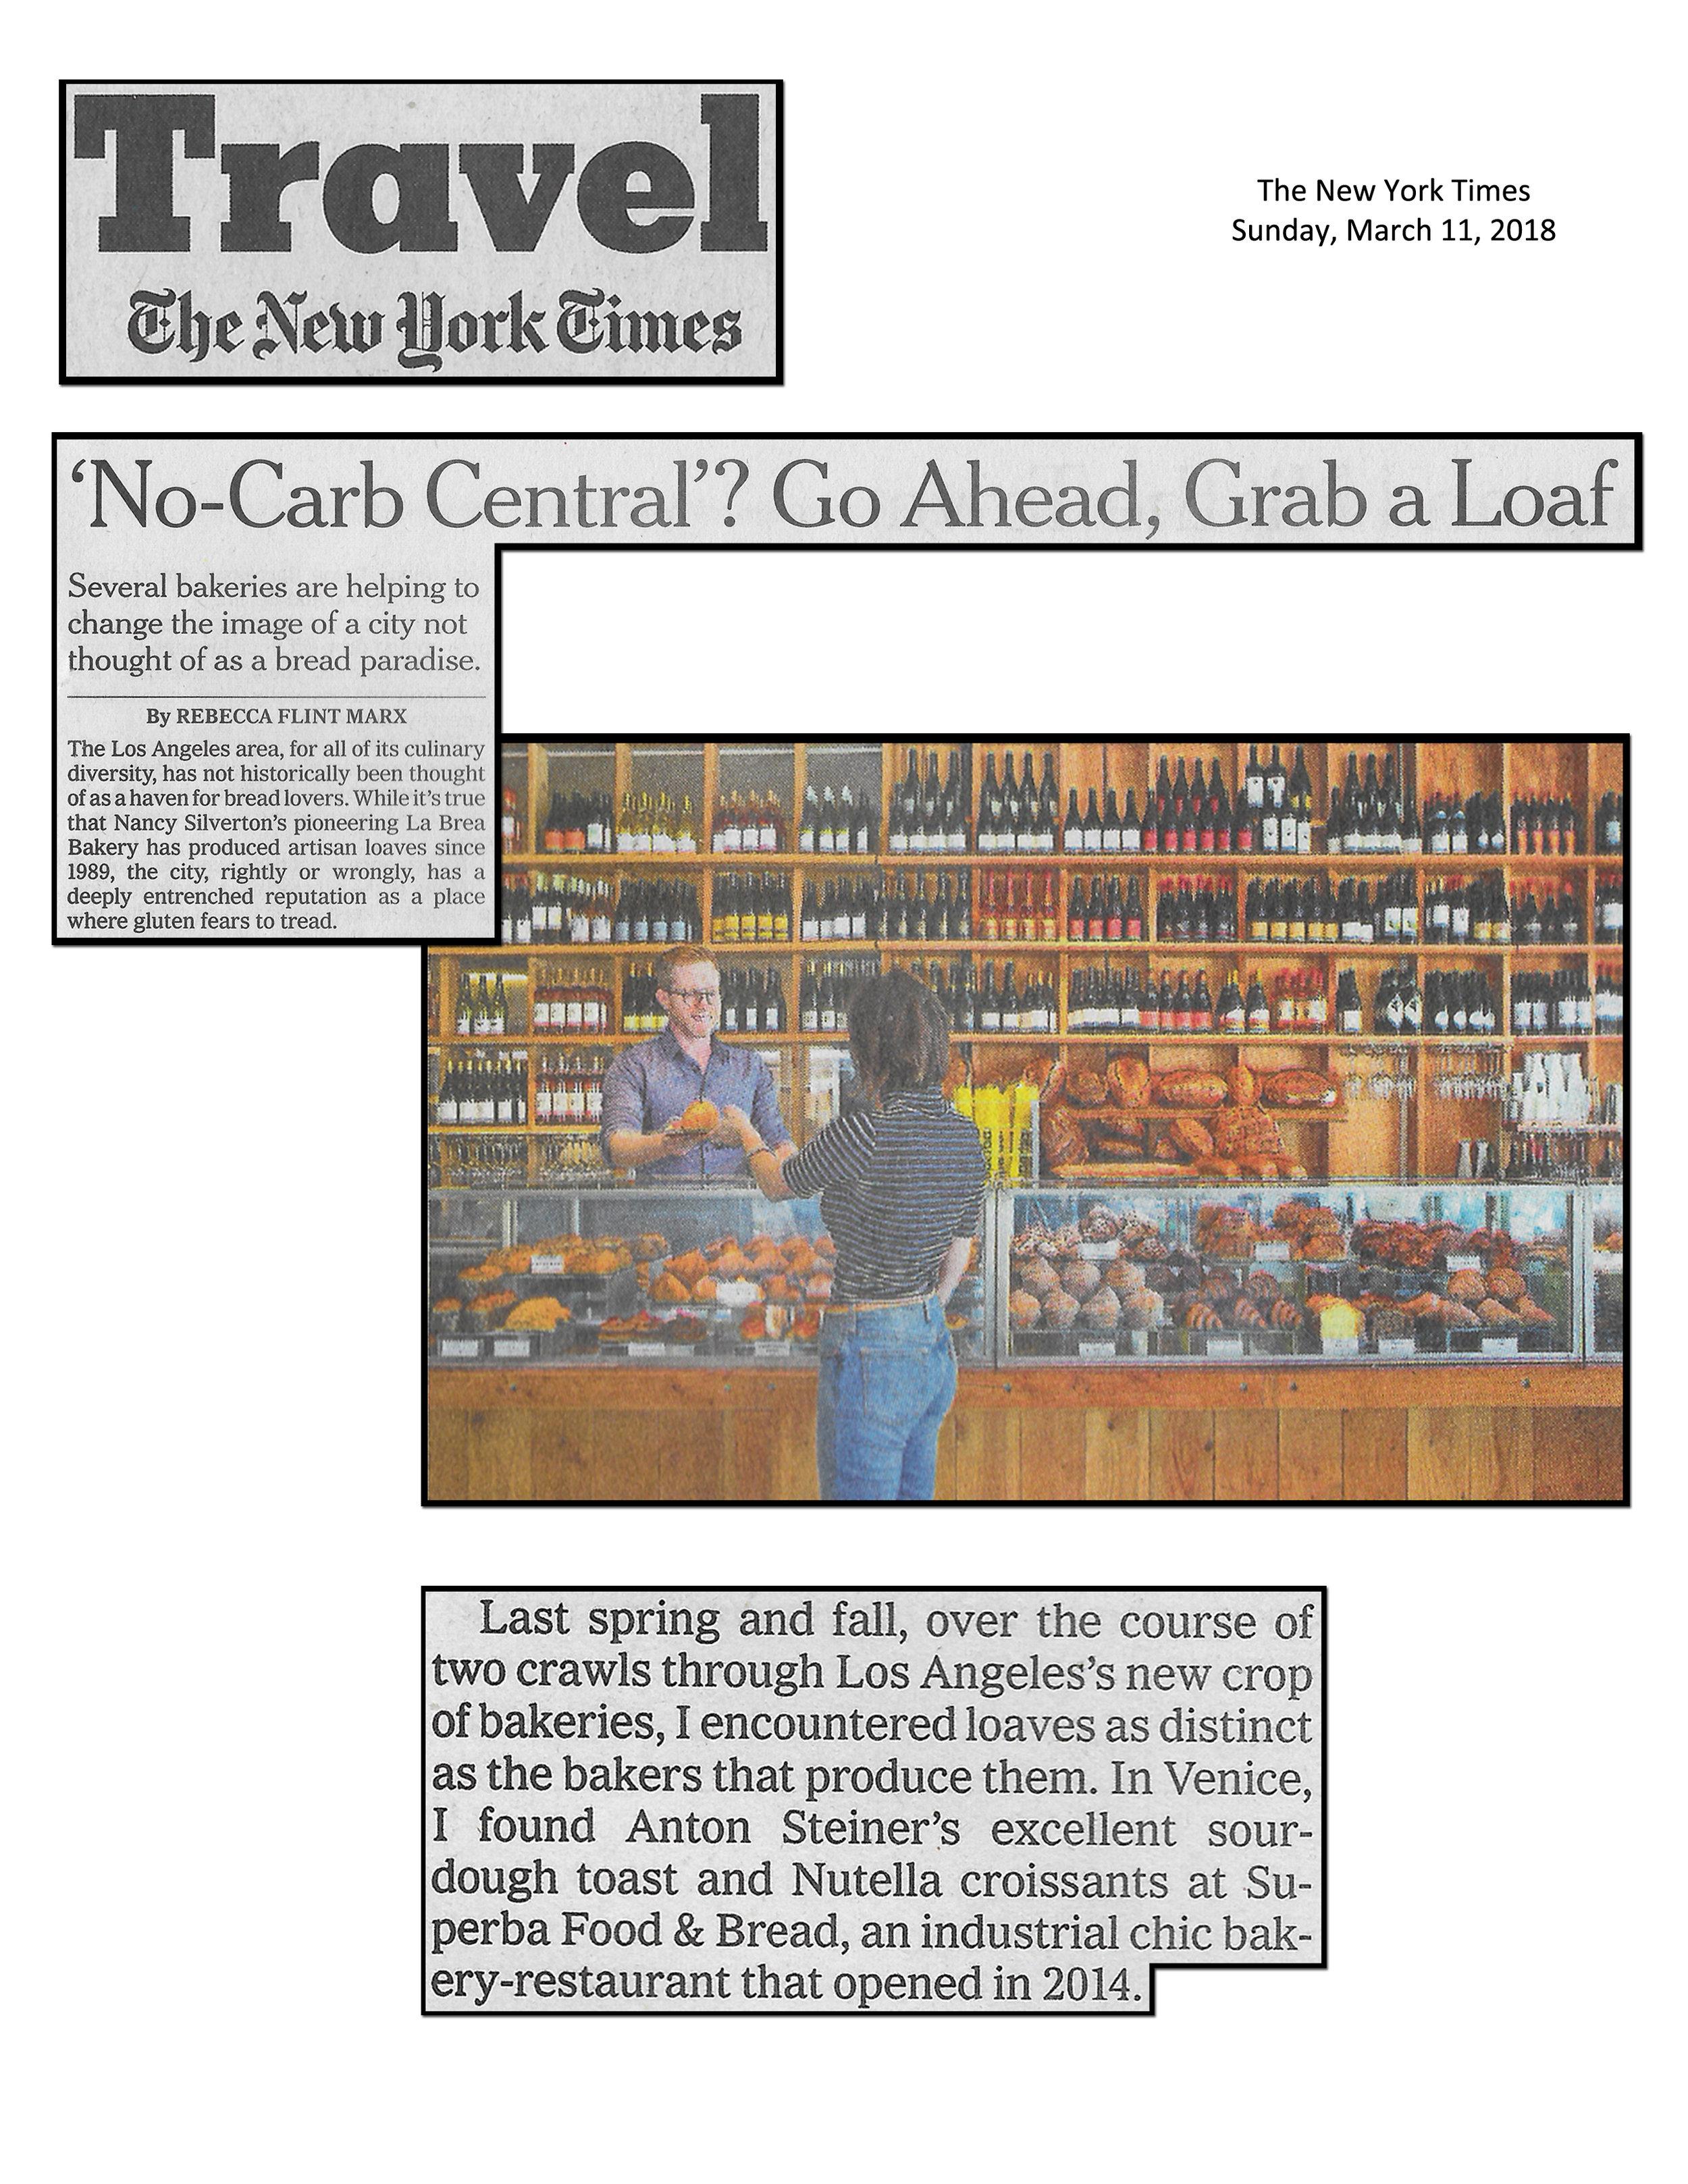 NewYorkTimes3.11.18_NC.jpg